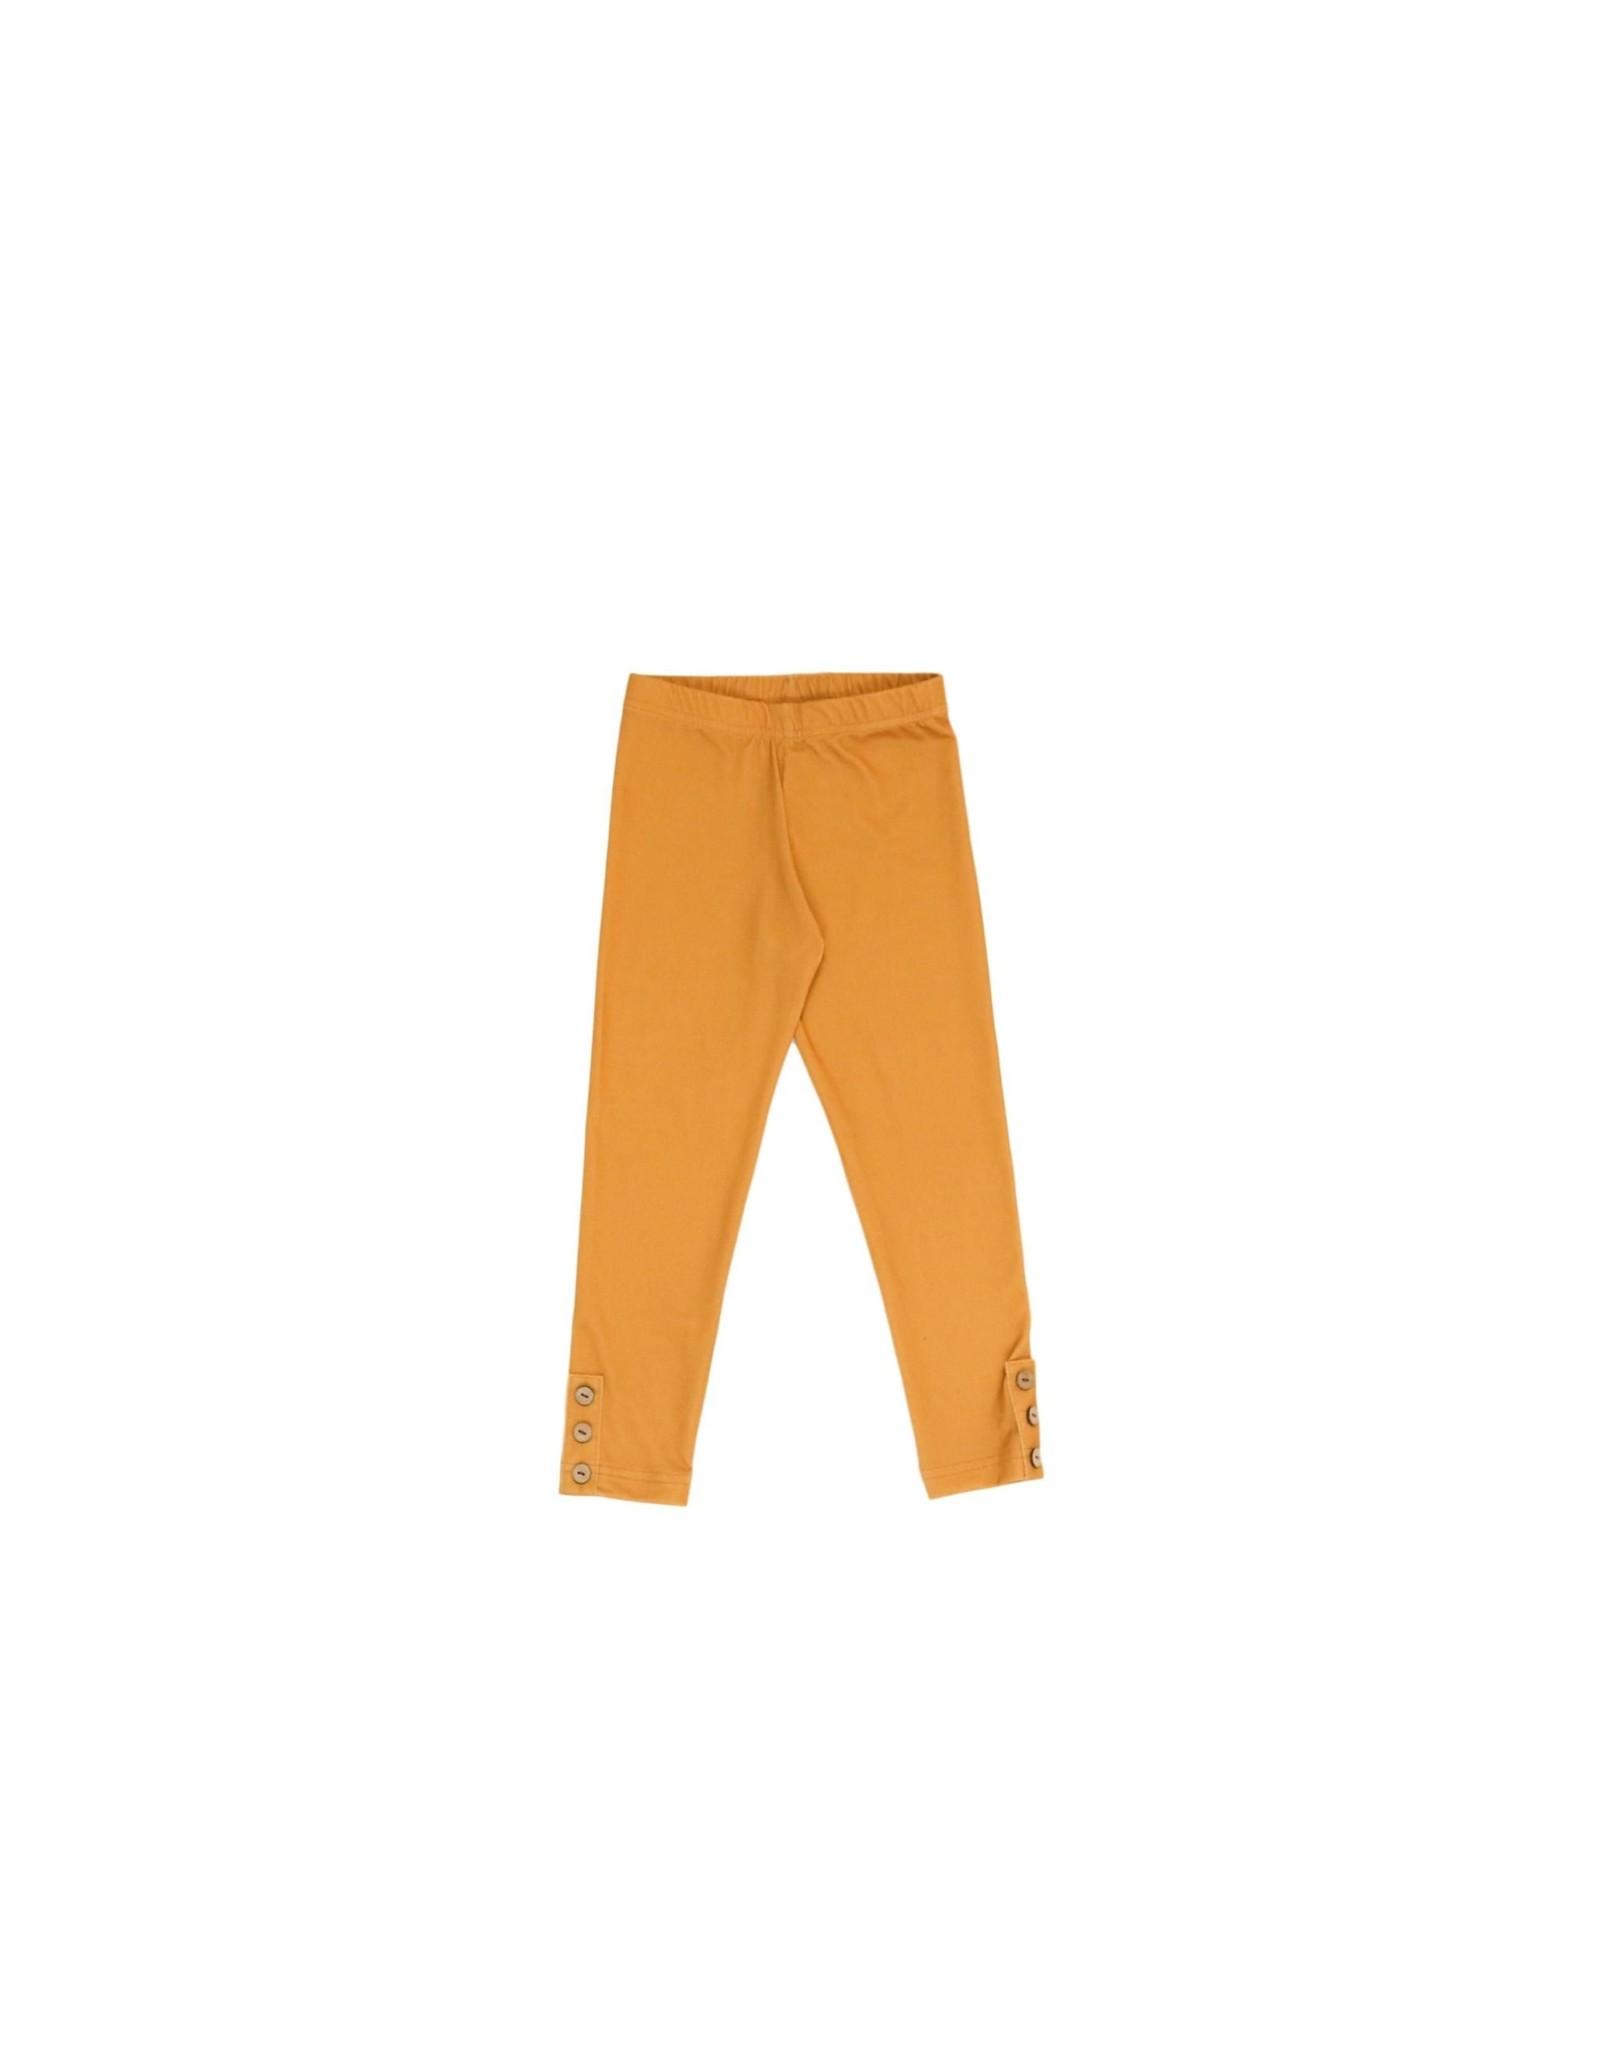 Be Girl Clothing Be Girl- Classic Button Leggings: Honey Mustard